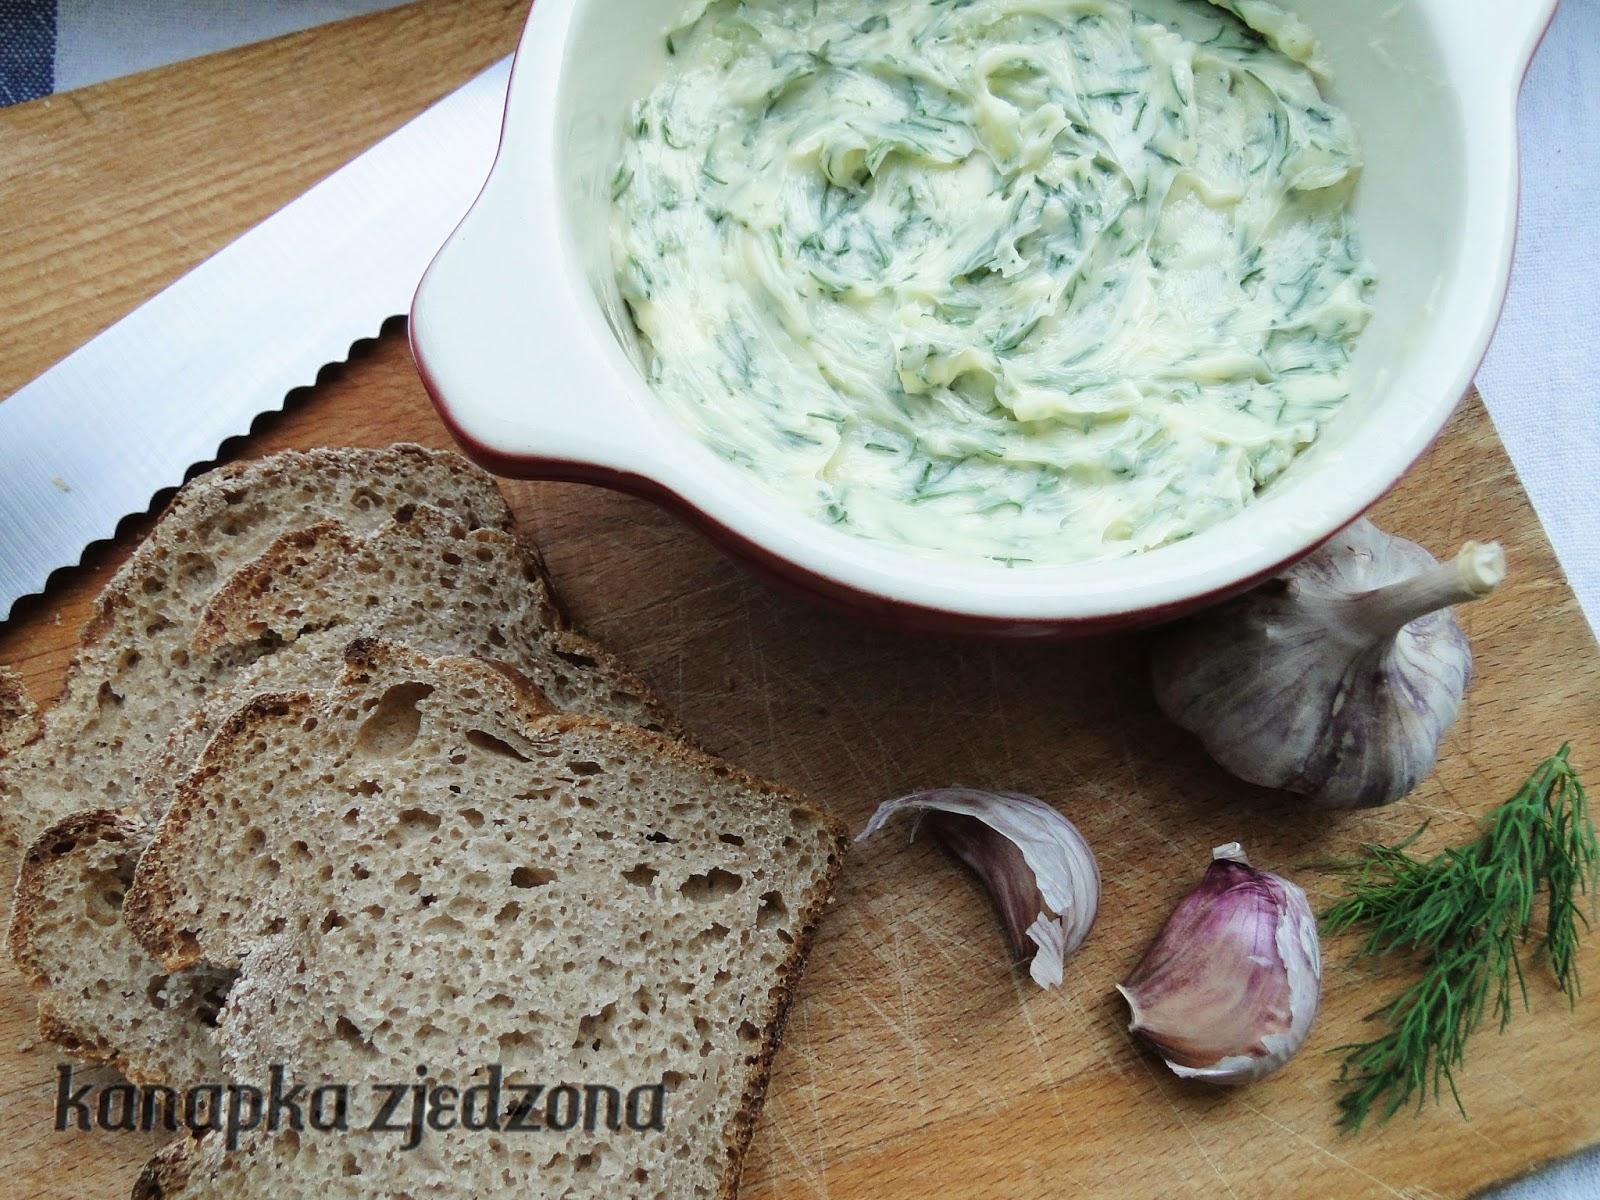 garlic butter, Knoblauchbutter, beurre à l'ail, mantequilla de ajo, masło czosnkowe